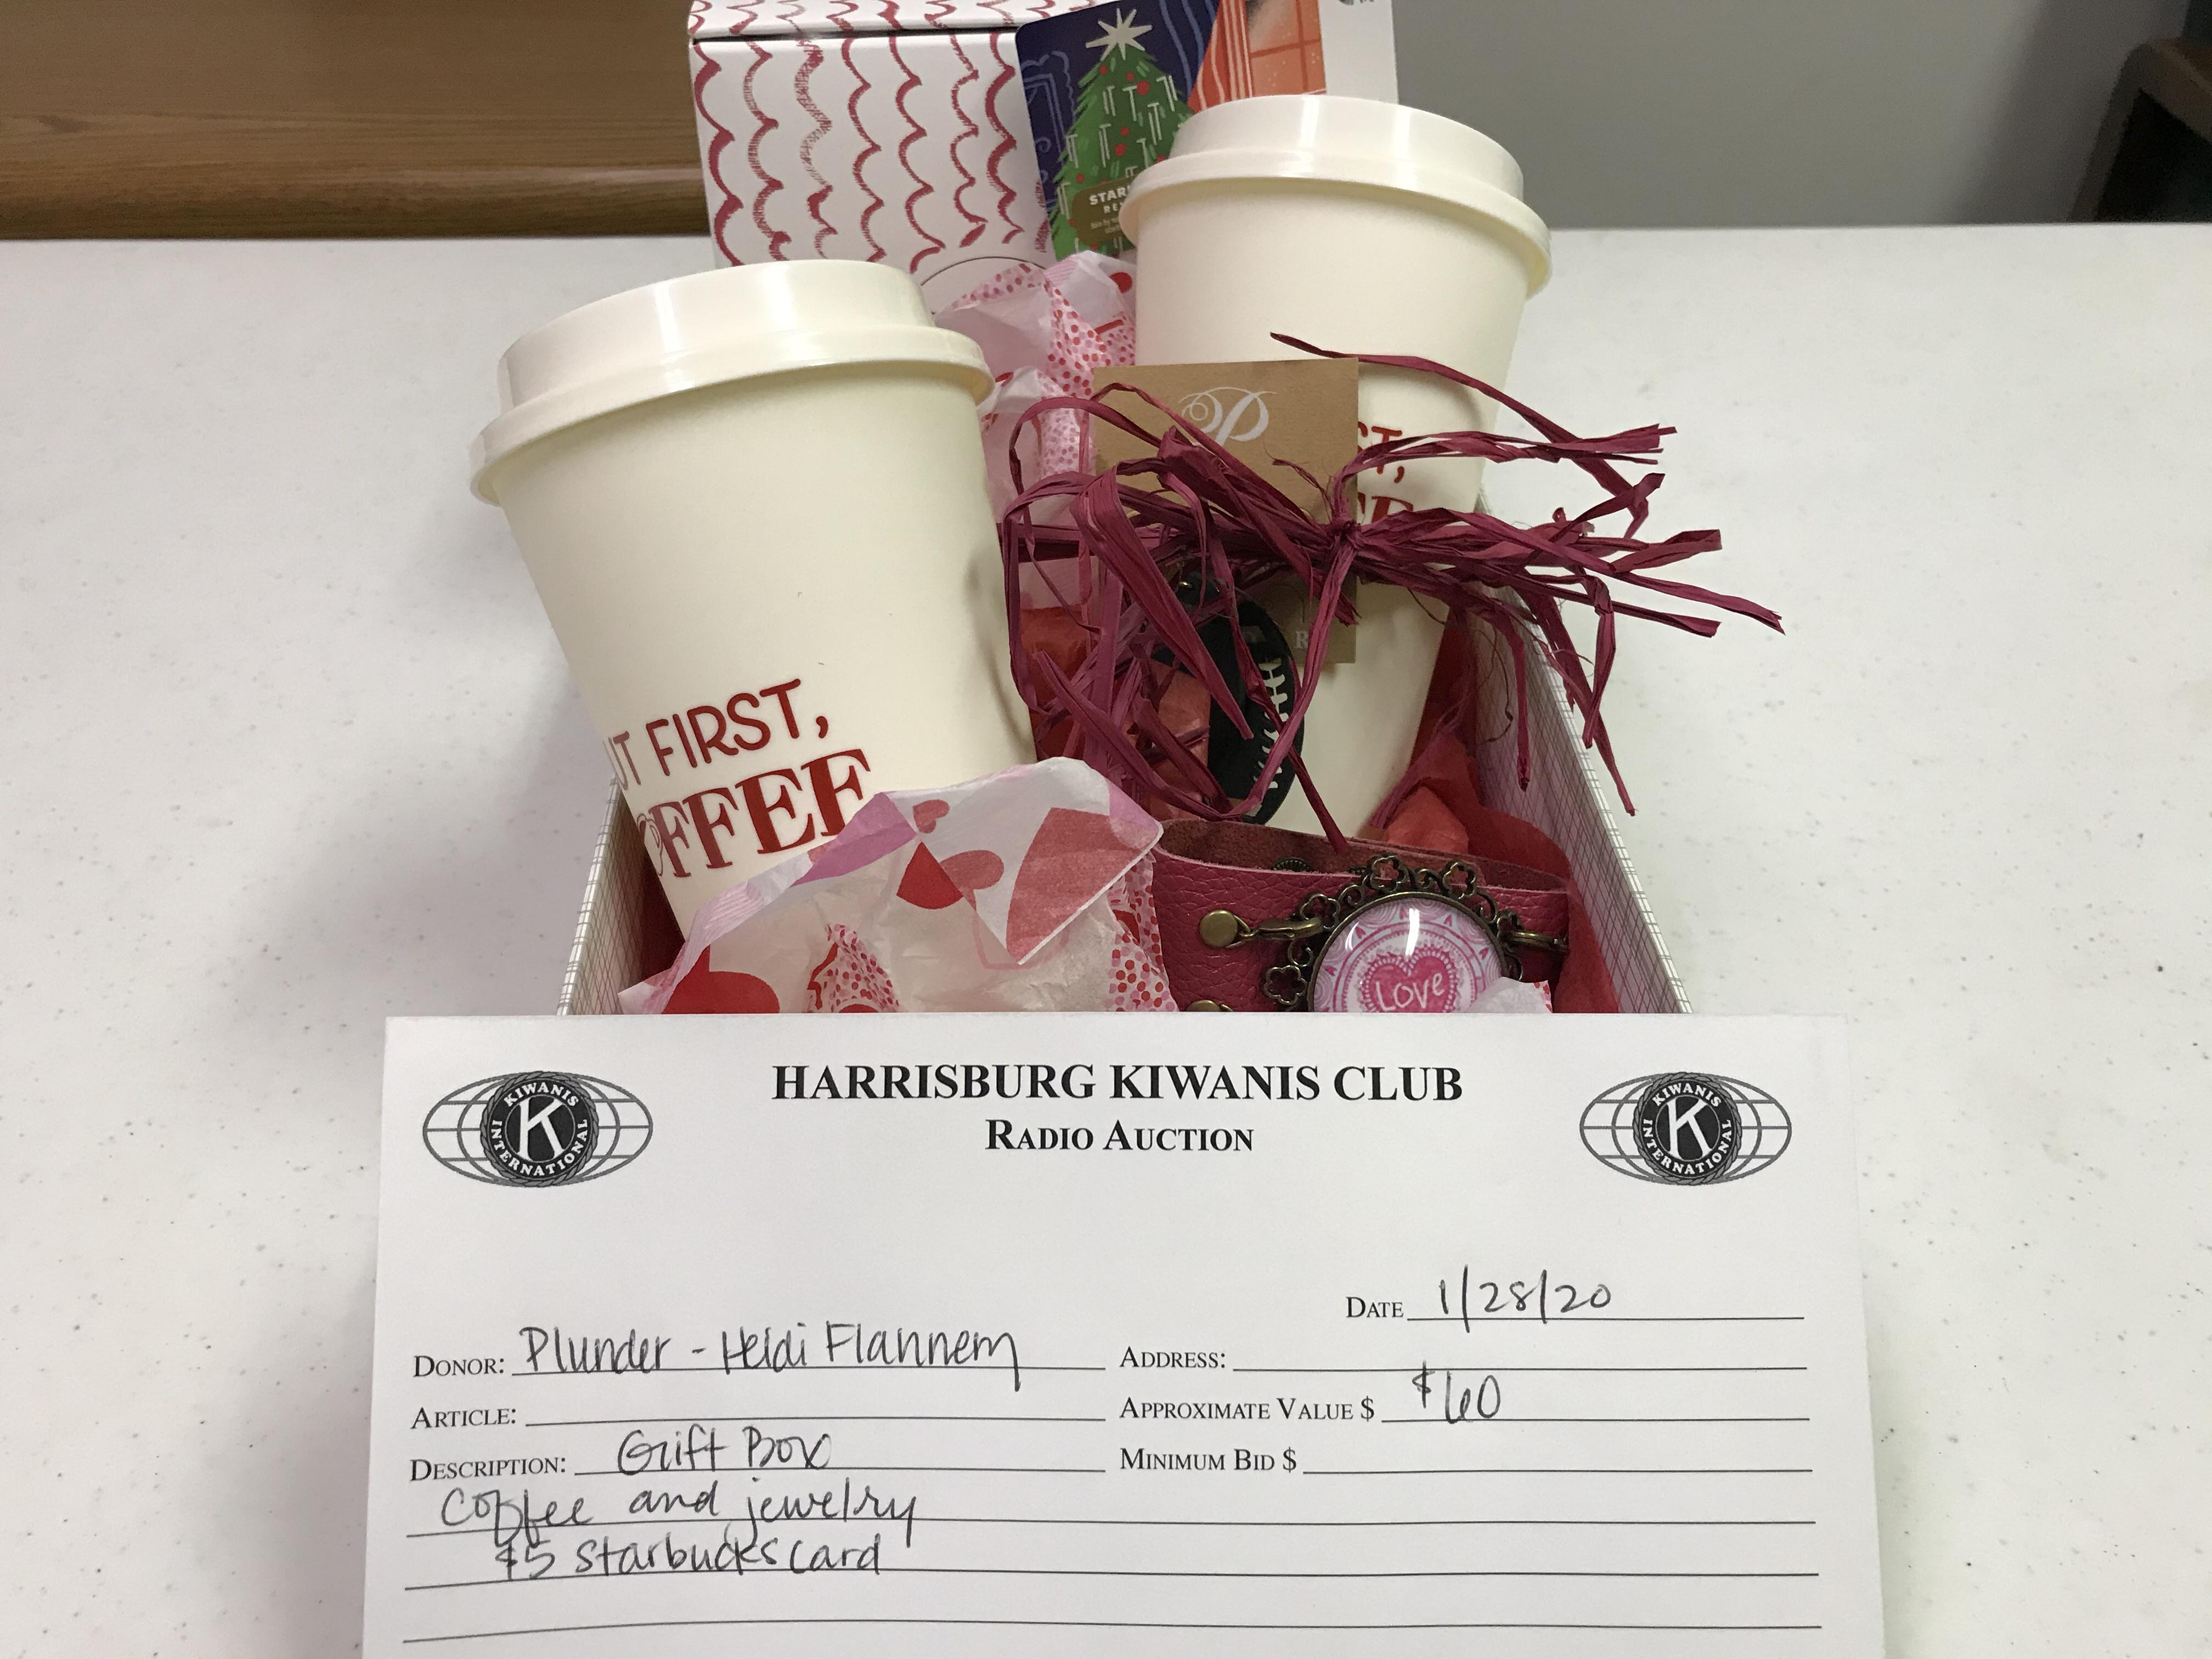 Item 122 - Plunder - Heidi Flannery Gift Box - Jewelry, Coffee Items, $5 Starbucks Card